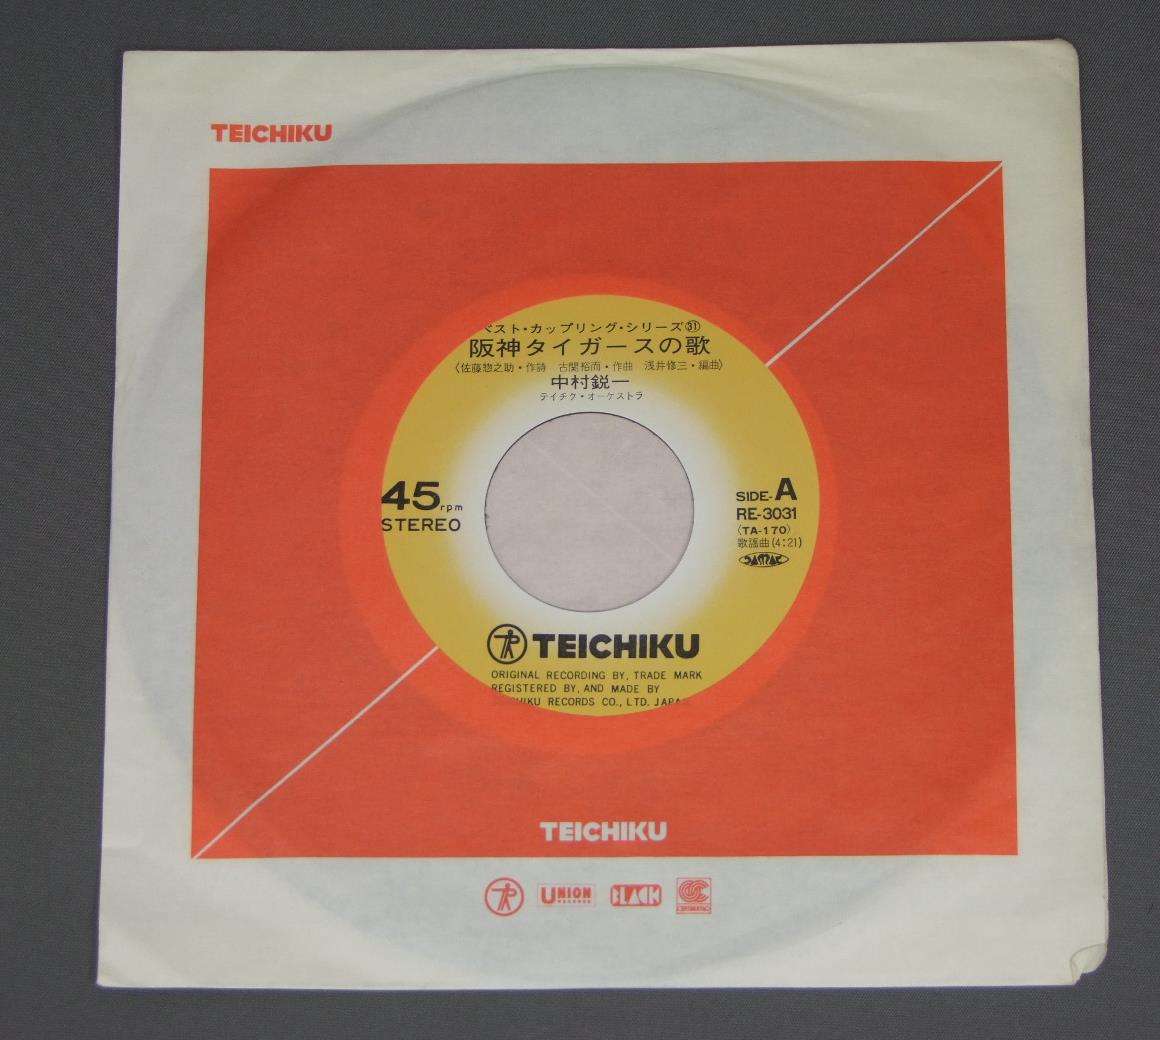 MIHO NAKAYAMA中村鋭一/ 阪神タイガースの歌 RE3031アナログレコード 詳細ペー